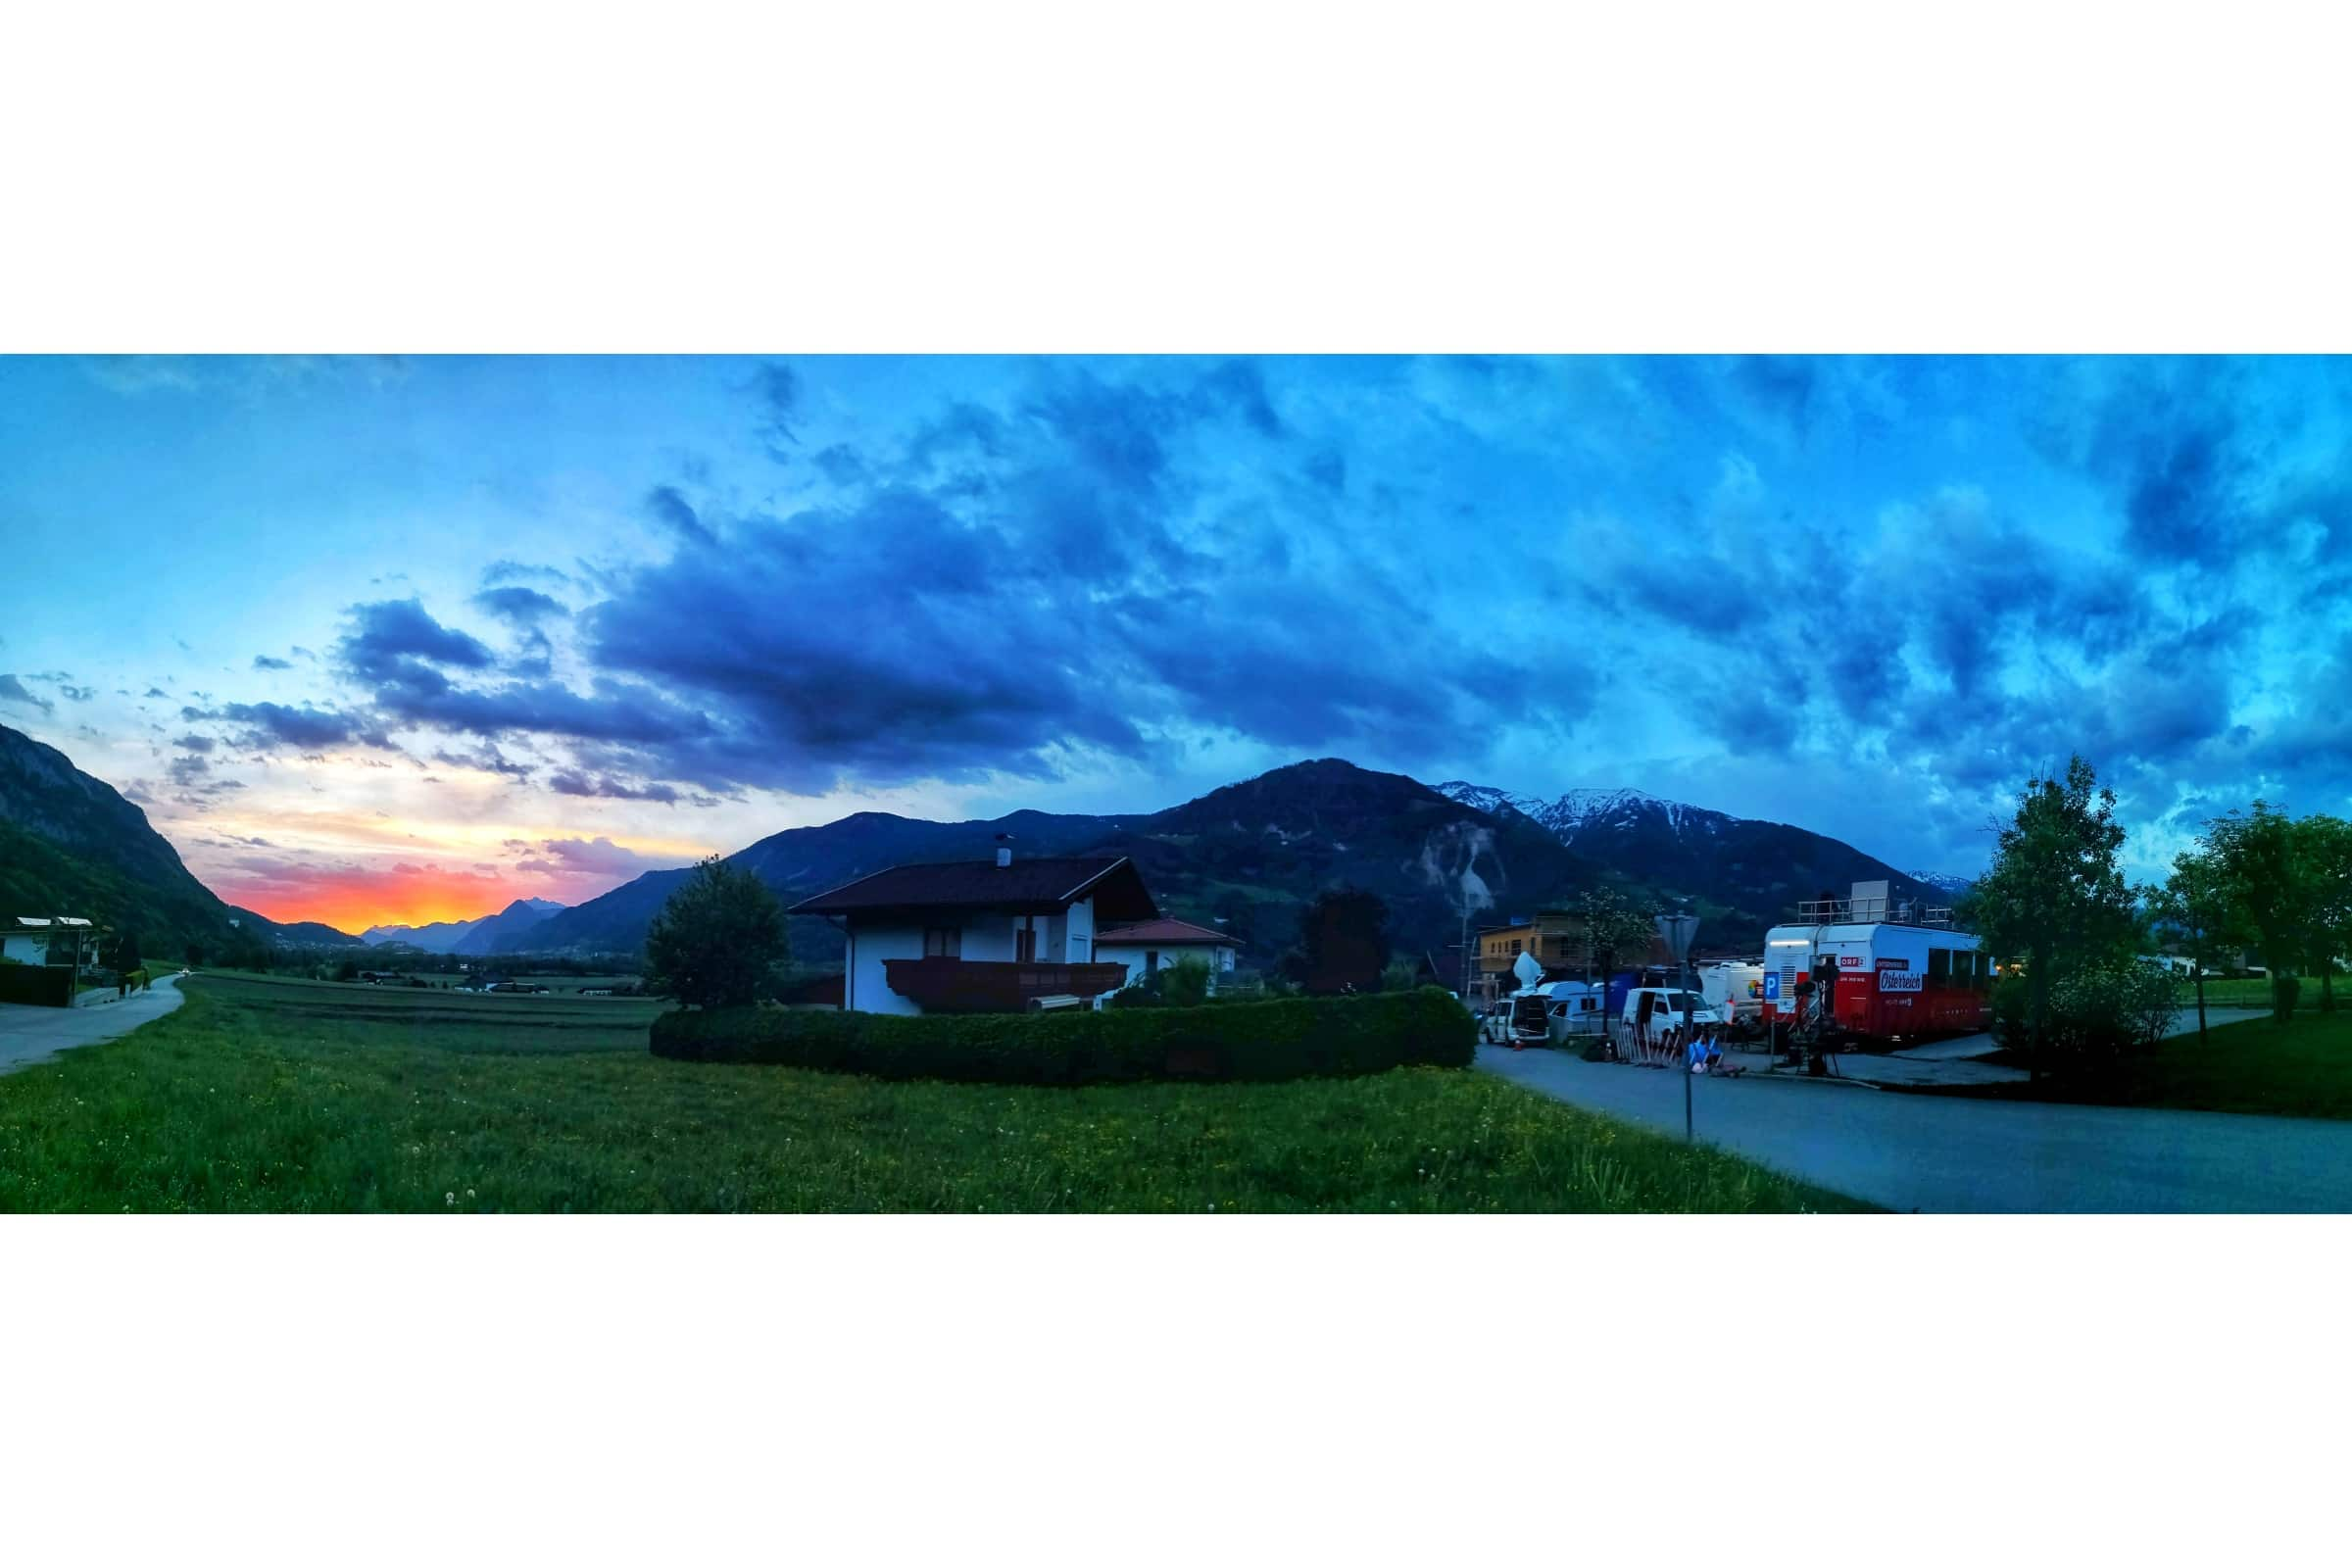 andreas felder kameramann orf unterwegs in österreich 28 30.04.2018 06 03 06 - ORF Unterwegs in Österreich - Tirol